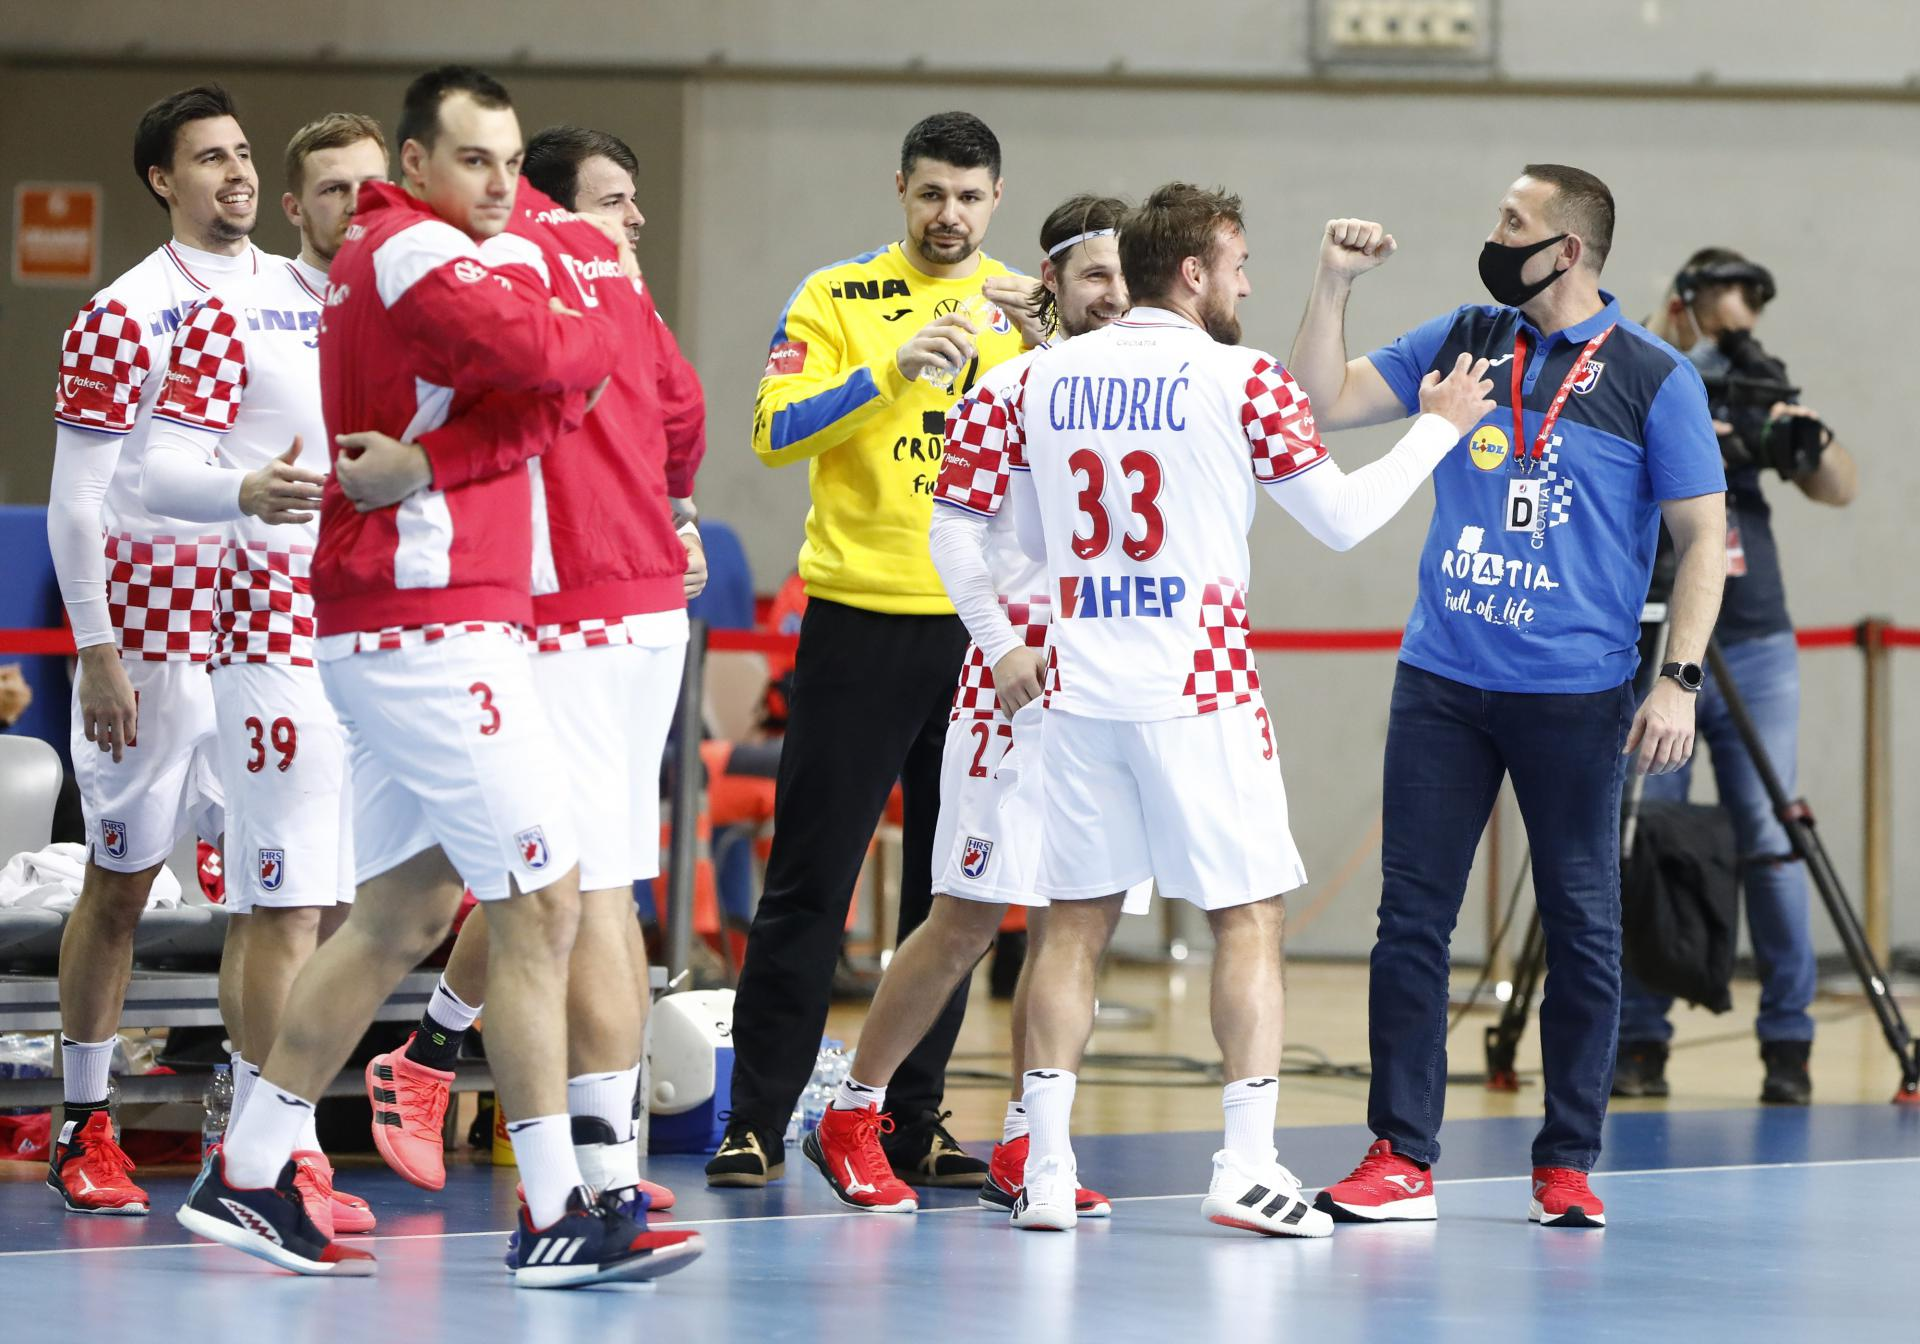 Dobre vijesti iz tabora hrvatske rukometne reprezentacije: cjelokupna delegacija negativna na oba testa na koronavirus